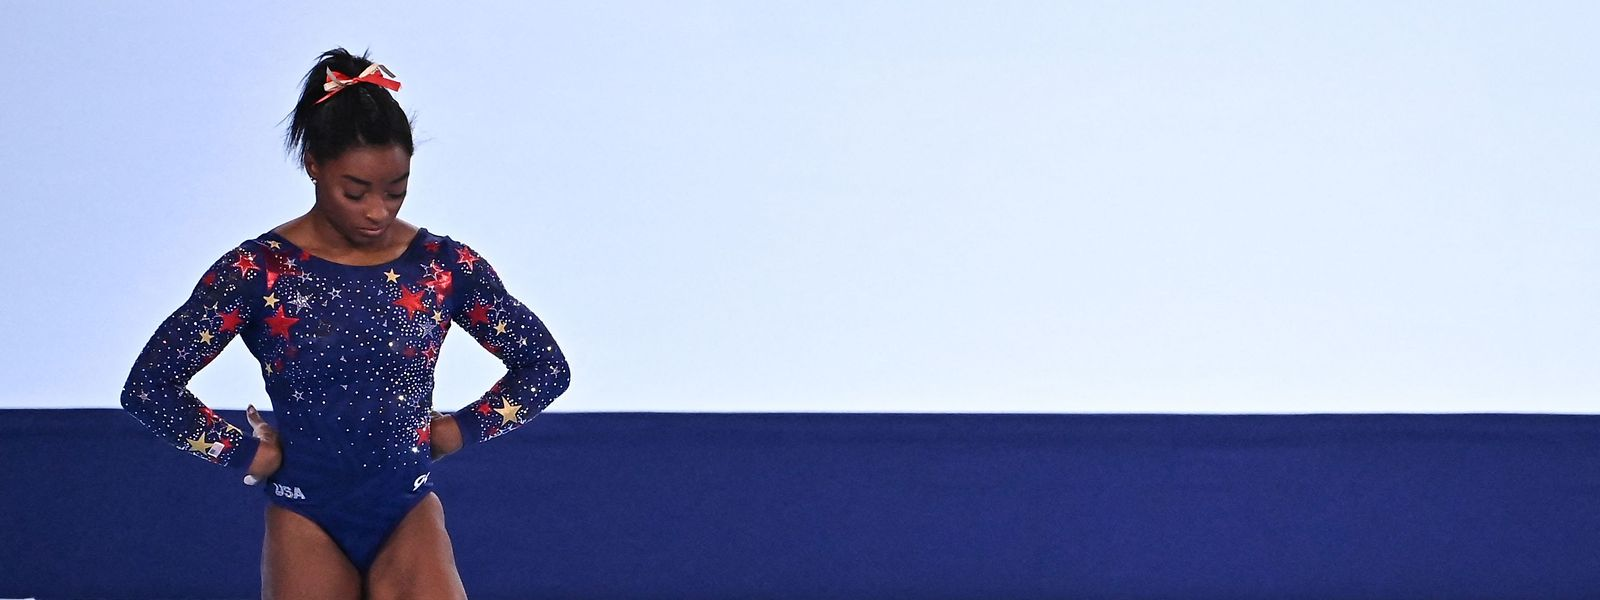 Simone Biles bei einem Olympia-Wettkampf am Sonntag.